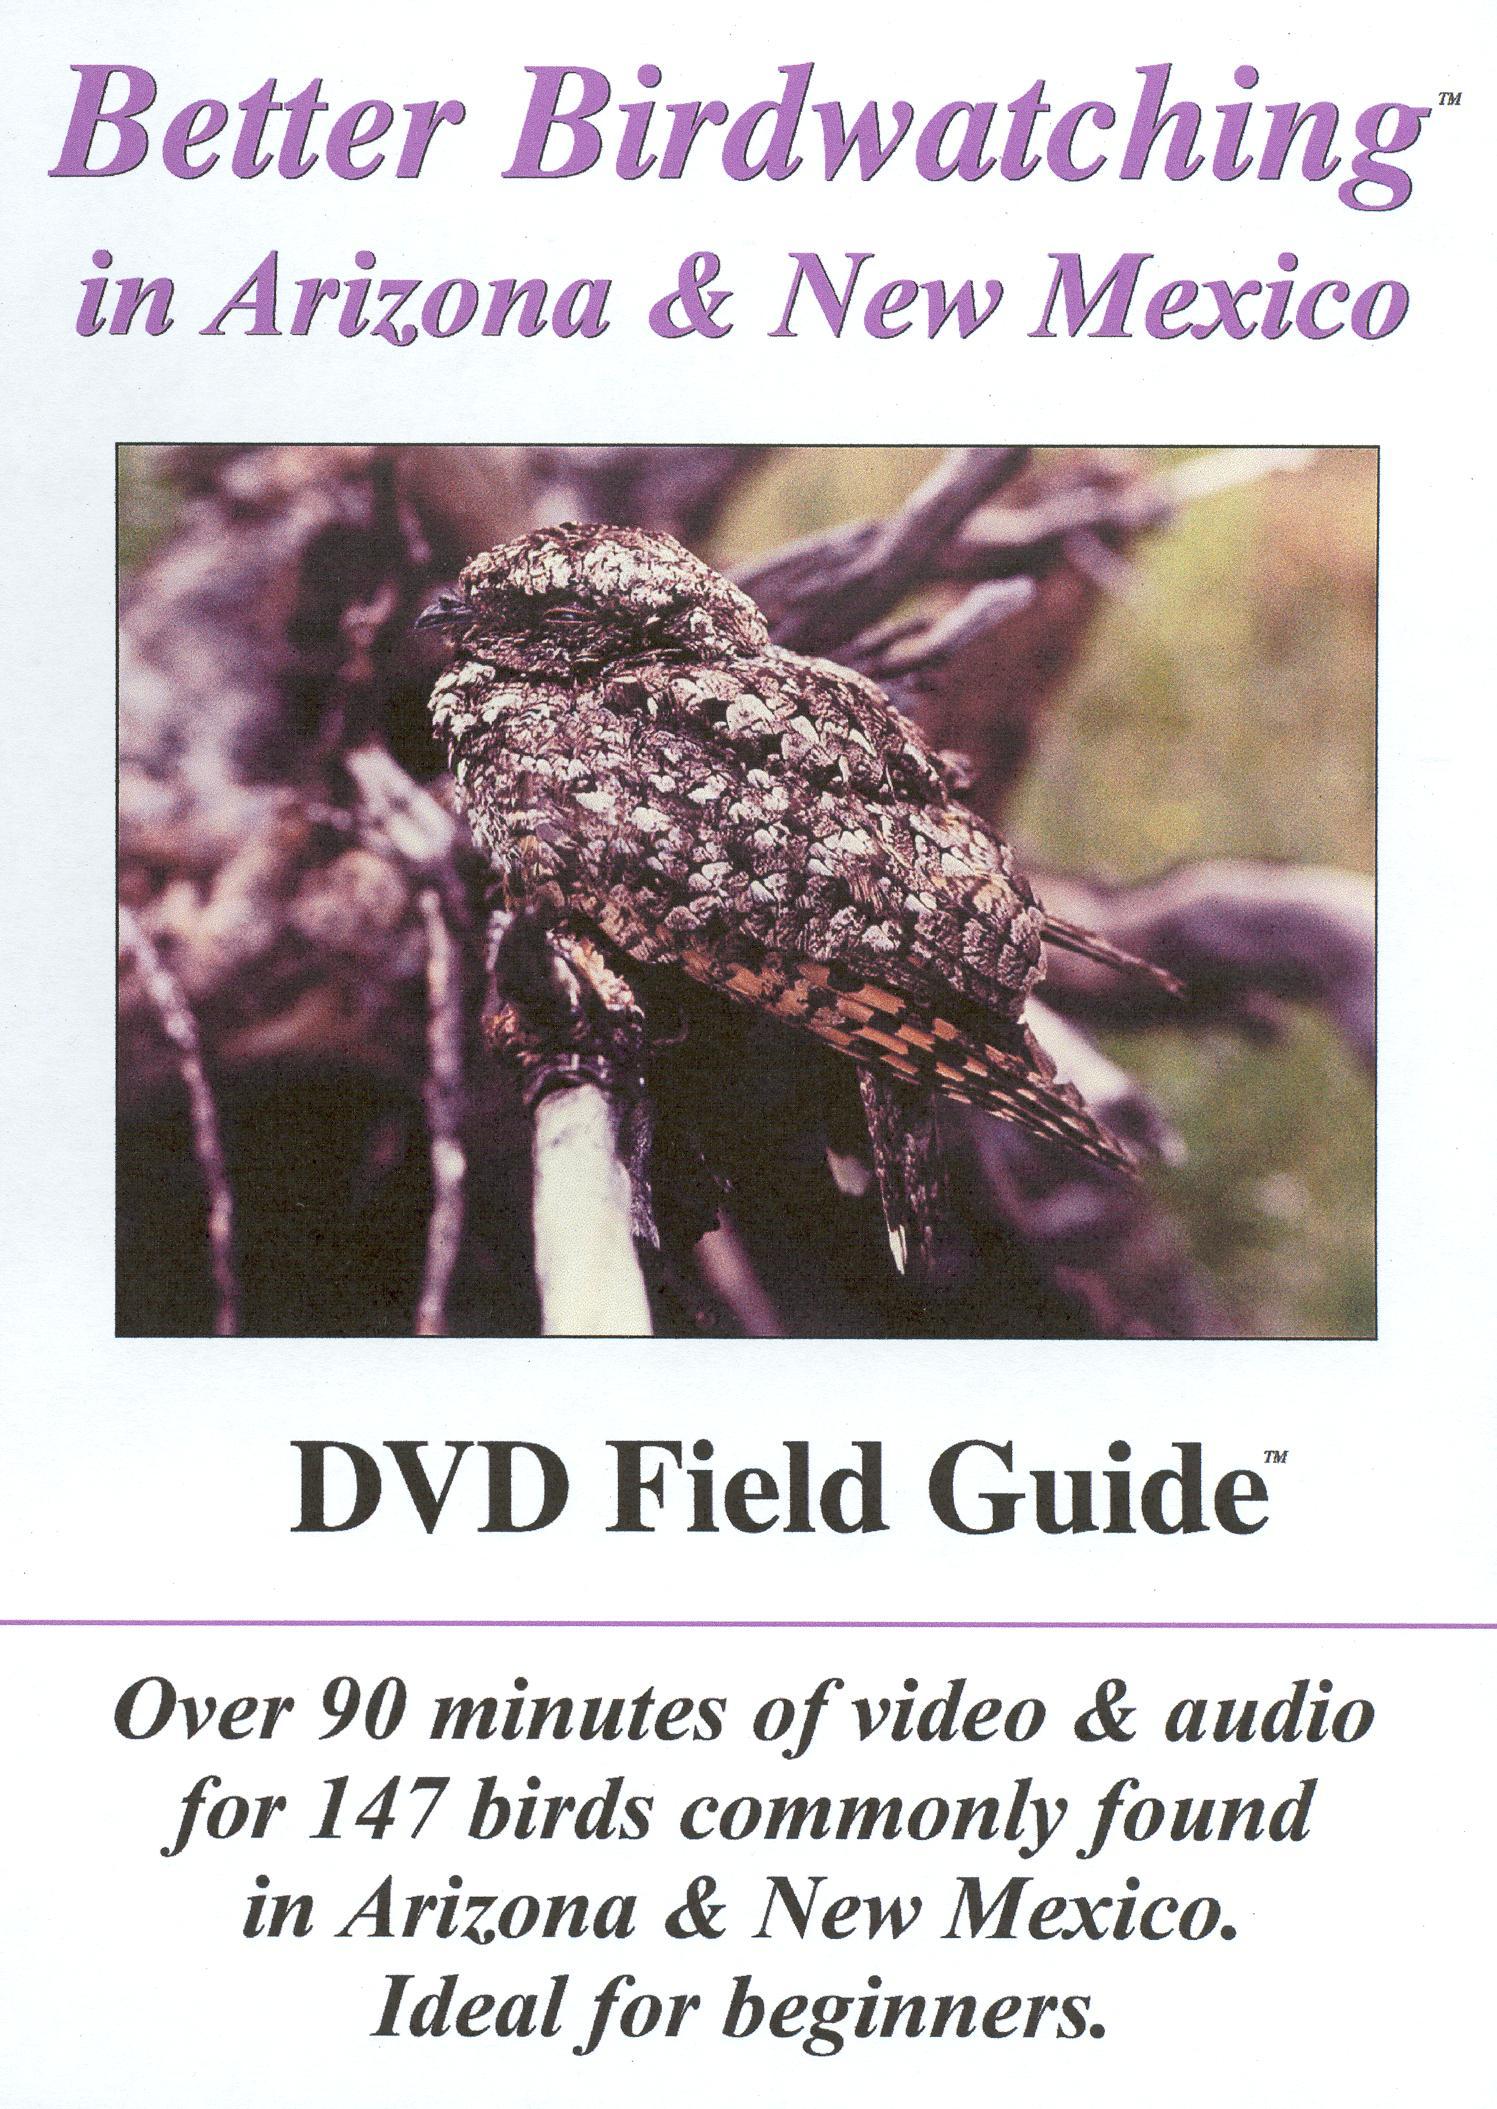 Better Birdwatching in Arizona & New Mexico